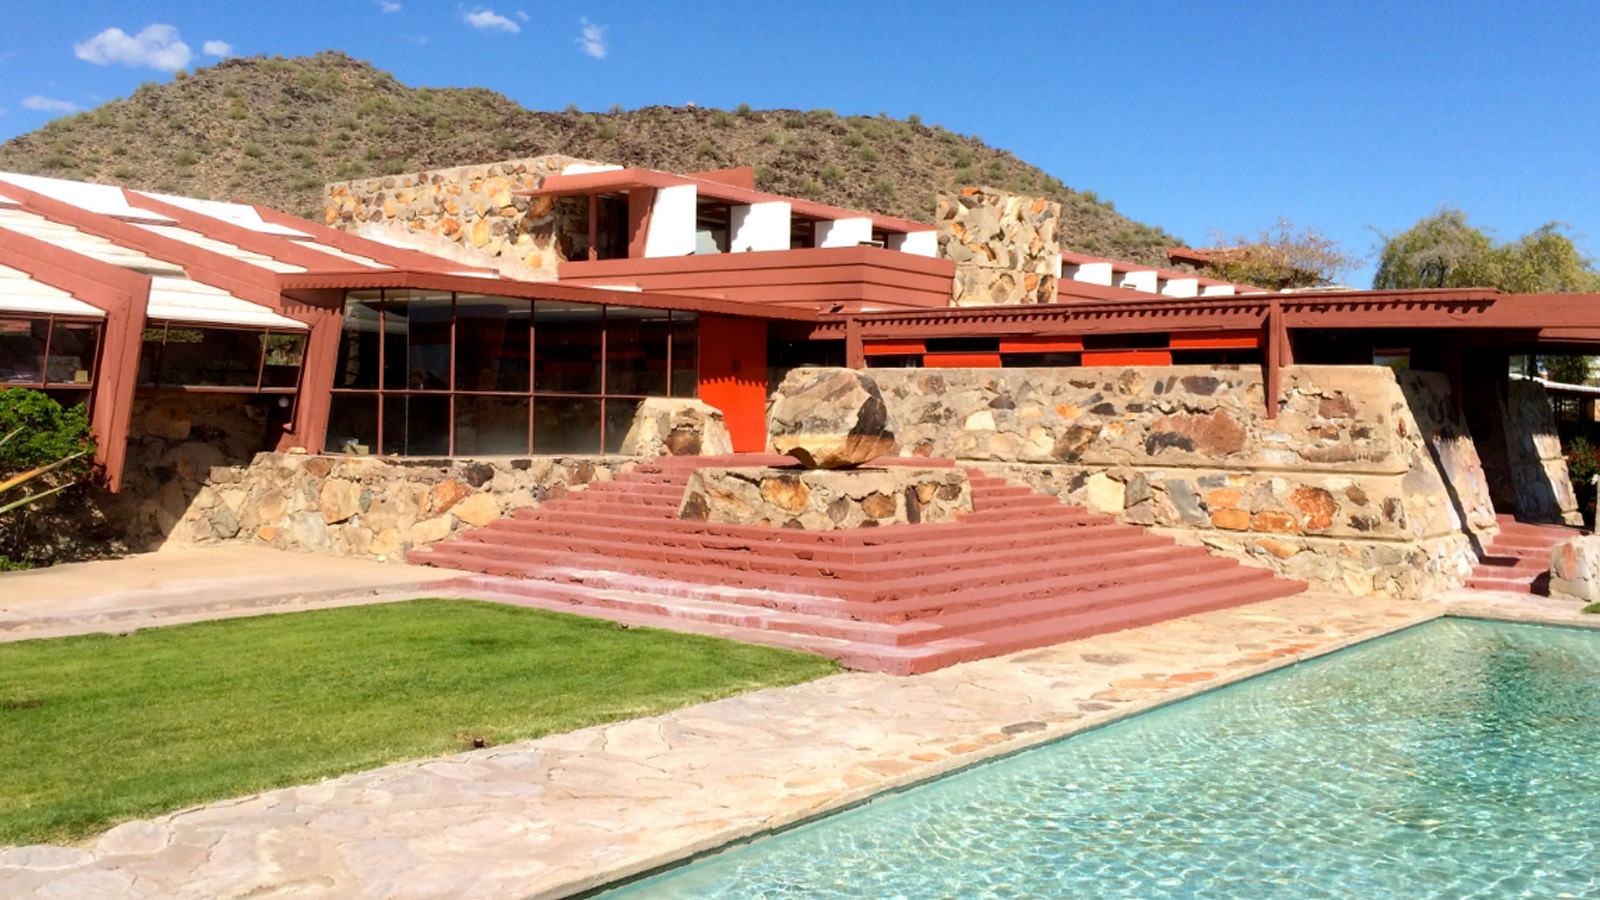 Frank Lloyd Wright, Taliesin West, Scottsdale, Arizona